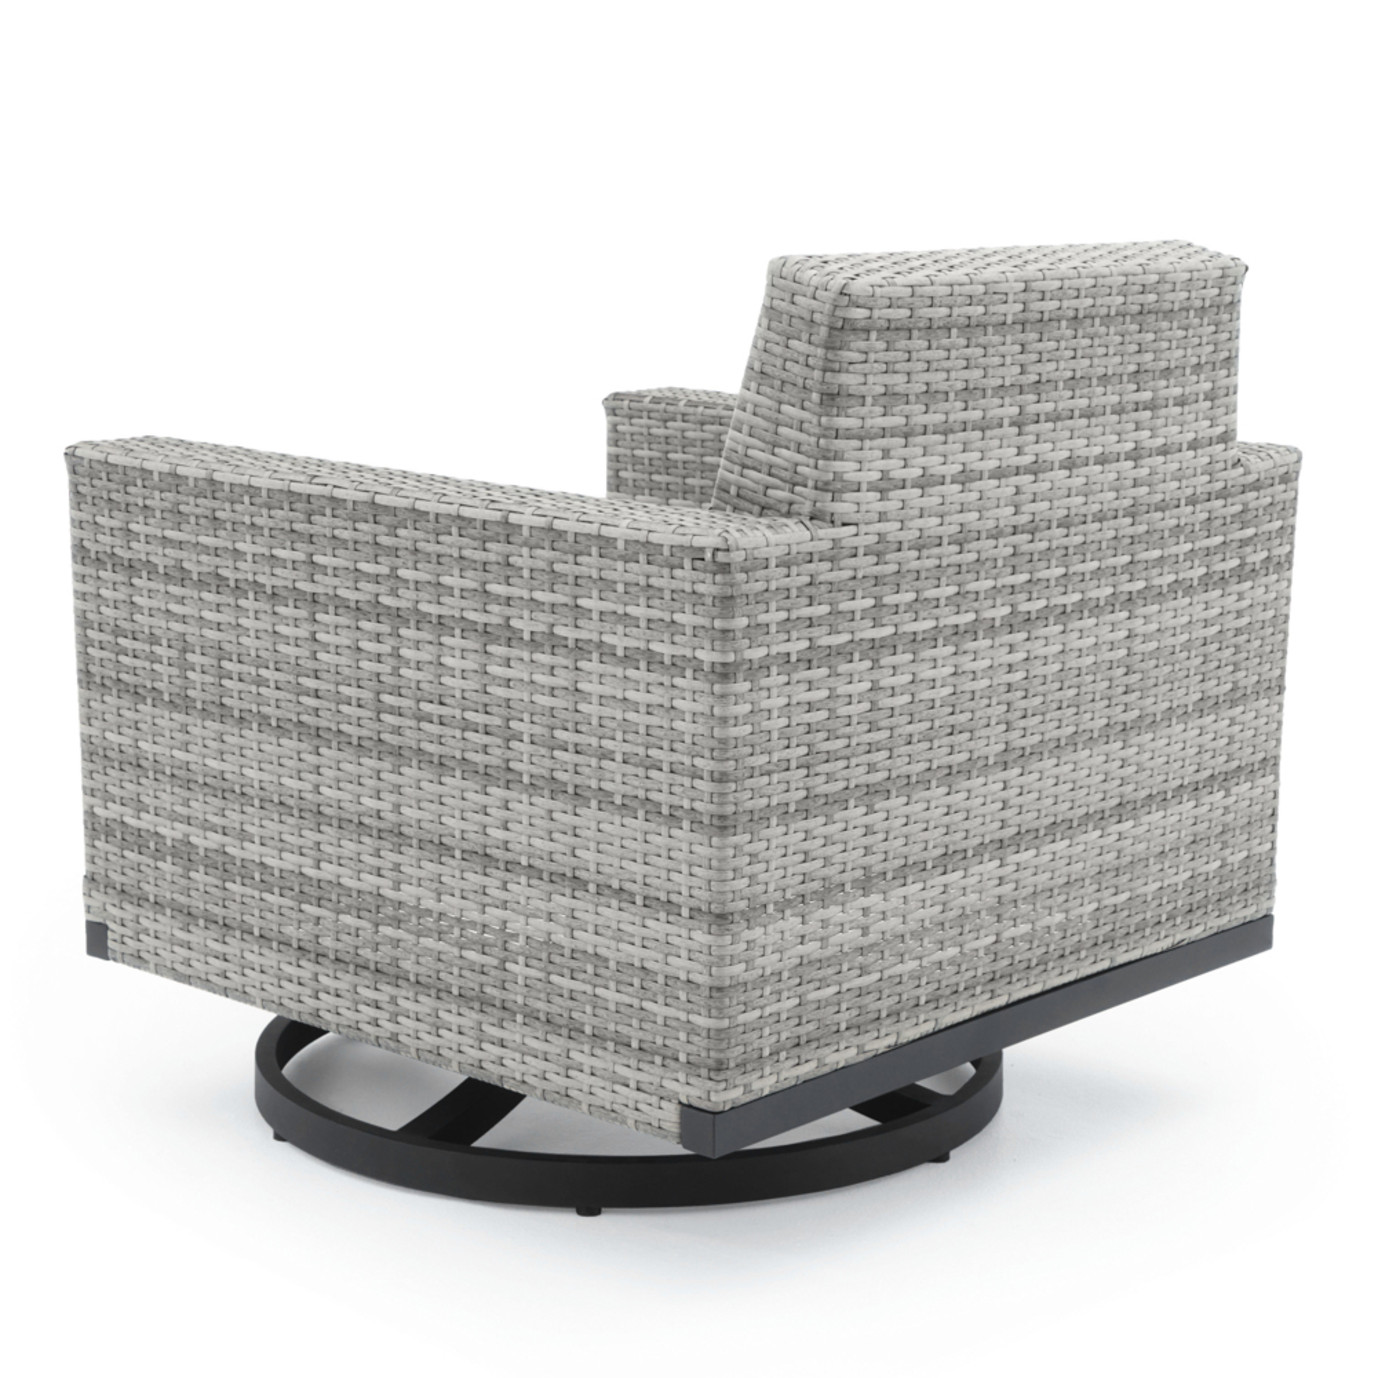 Milo™ Gray Motion Club Chairs - Charcoal Gray